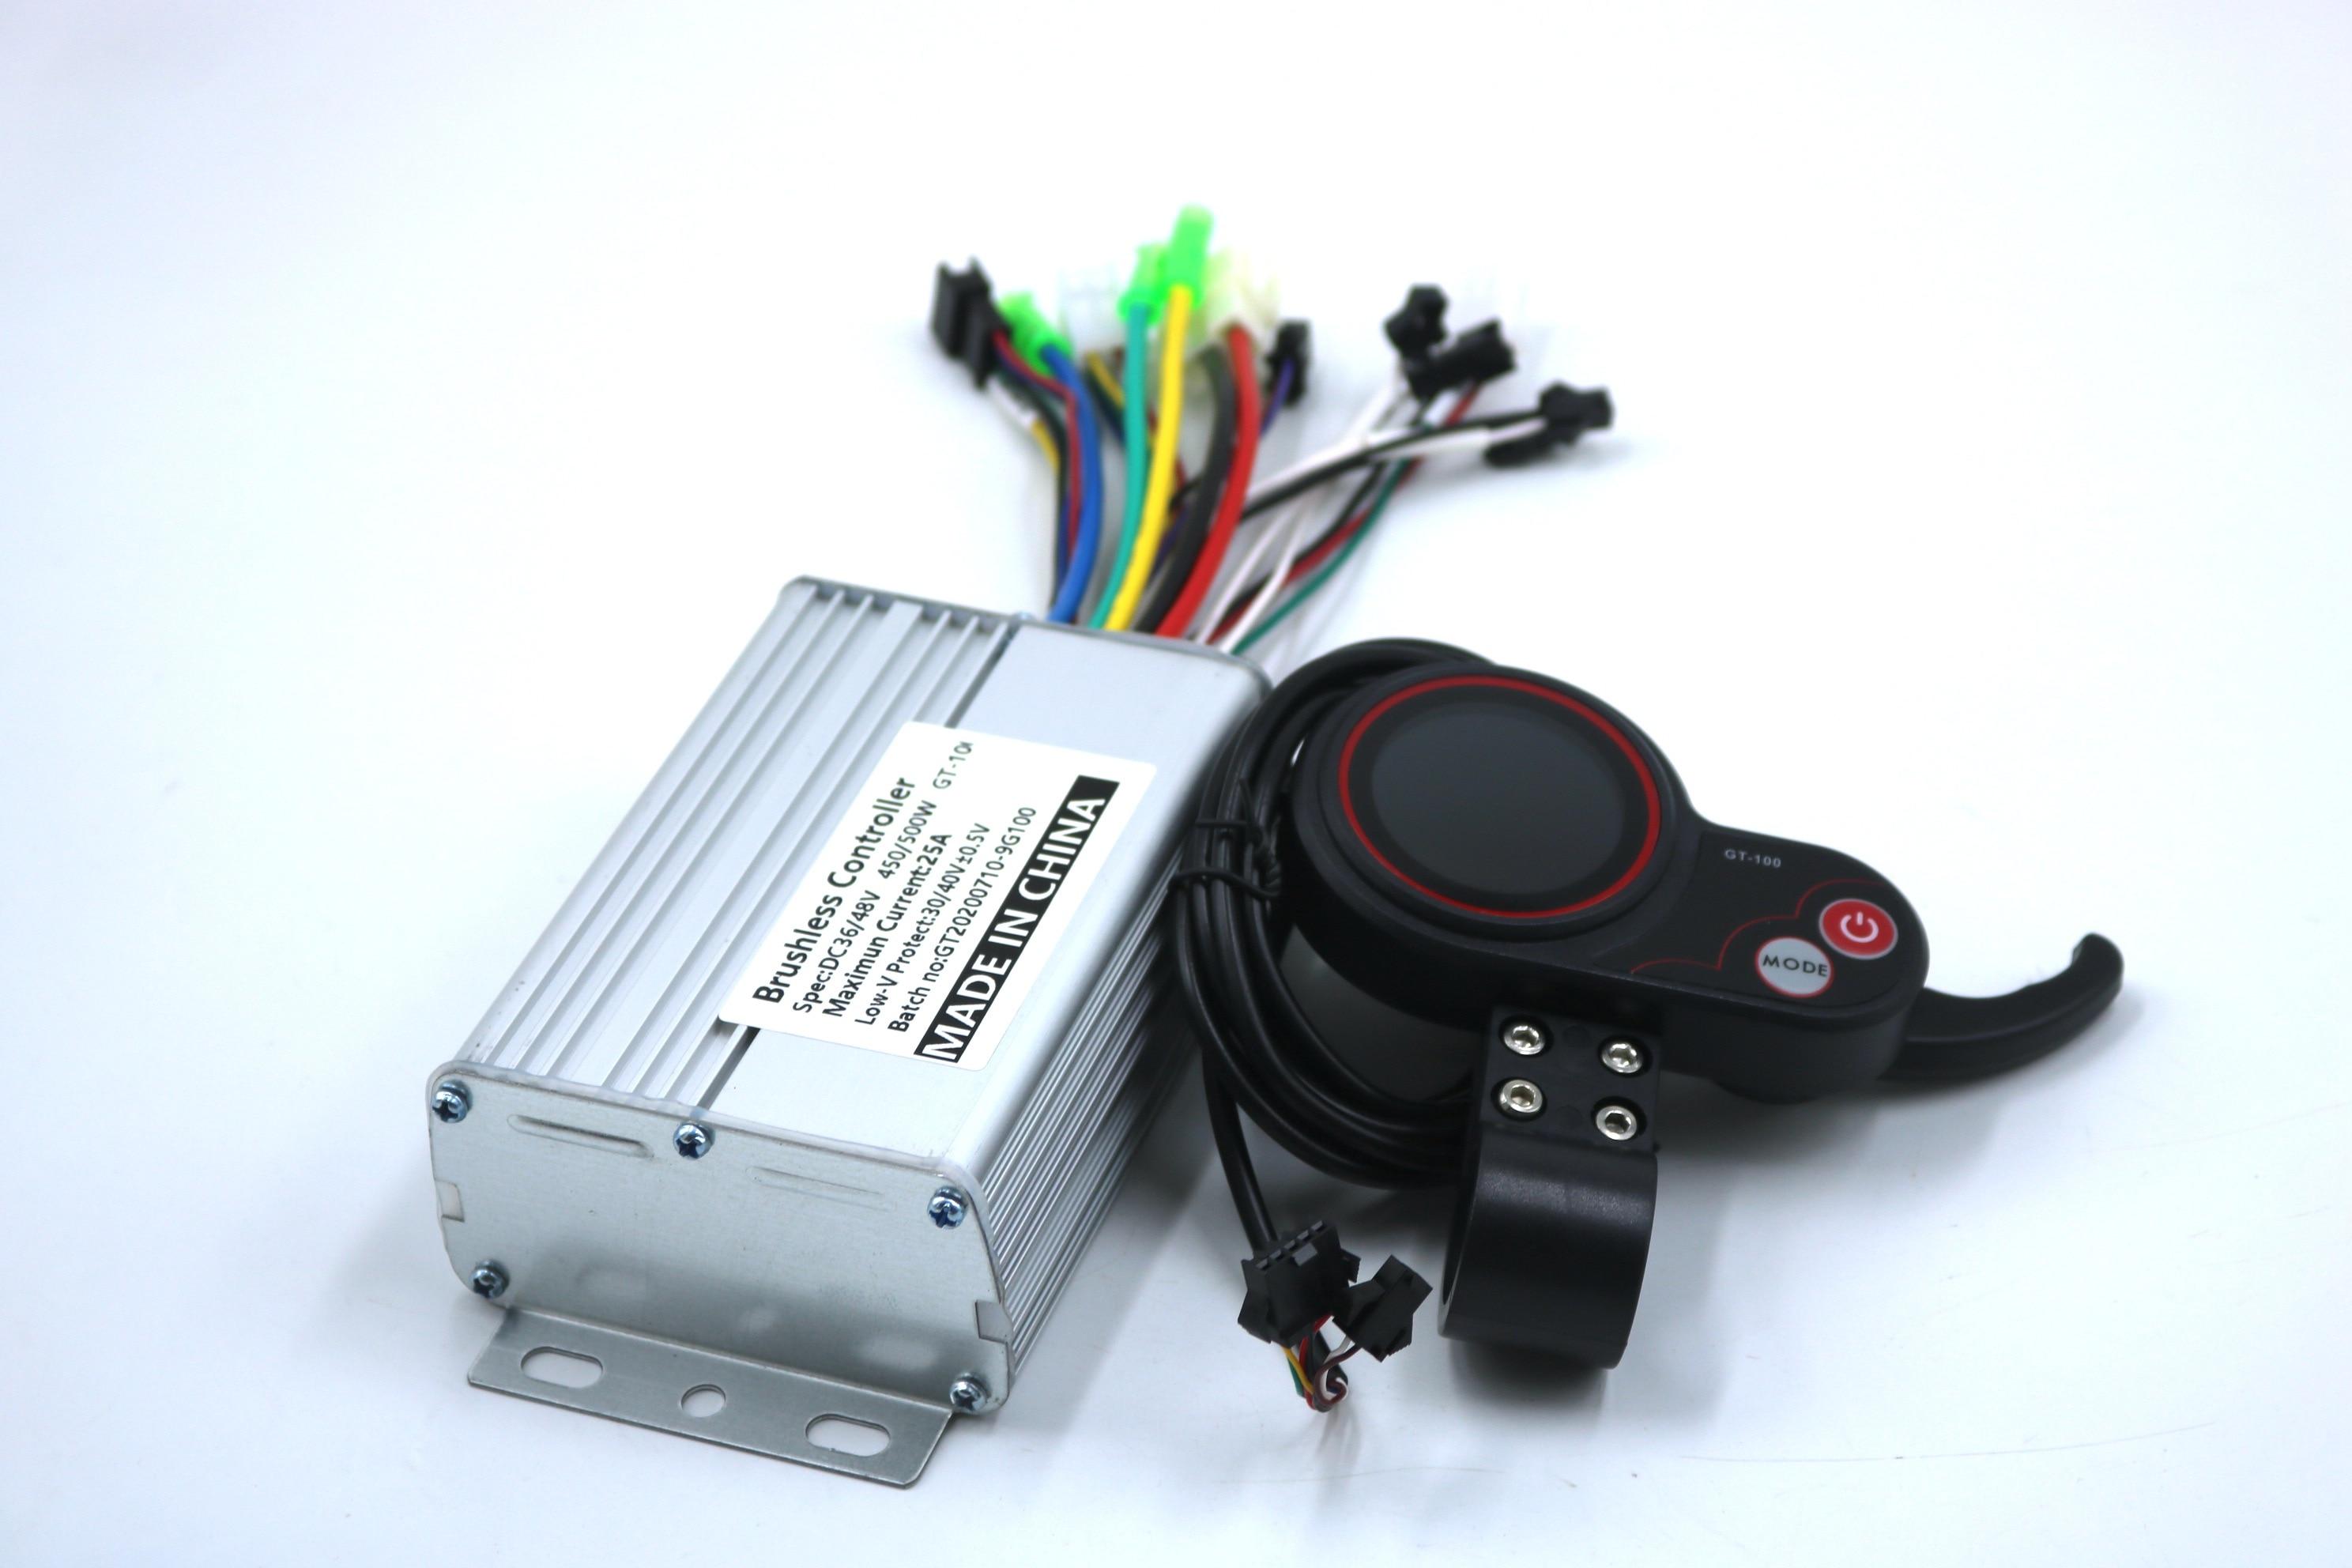 9MOSFET GREENTIME 36 فولت/48 فولت 450/500 واط BLDC سكوتر كهربائي تحكم E-الدراجة فرش سرعة سائق و GT-100 شاشة الكريستال السائل مجموعة واحدة